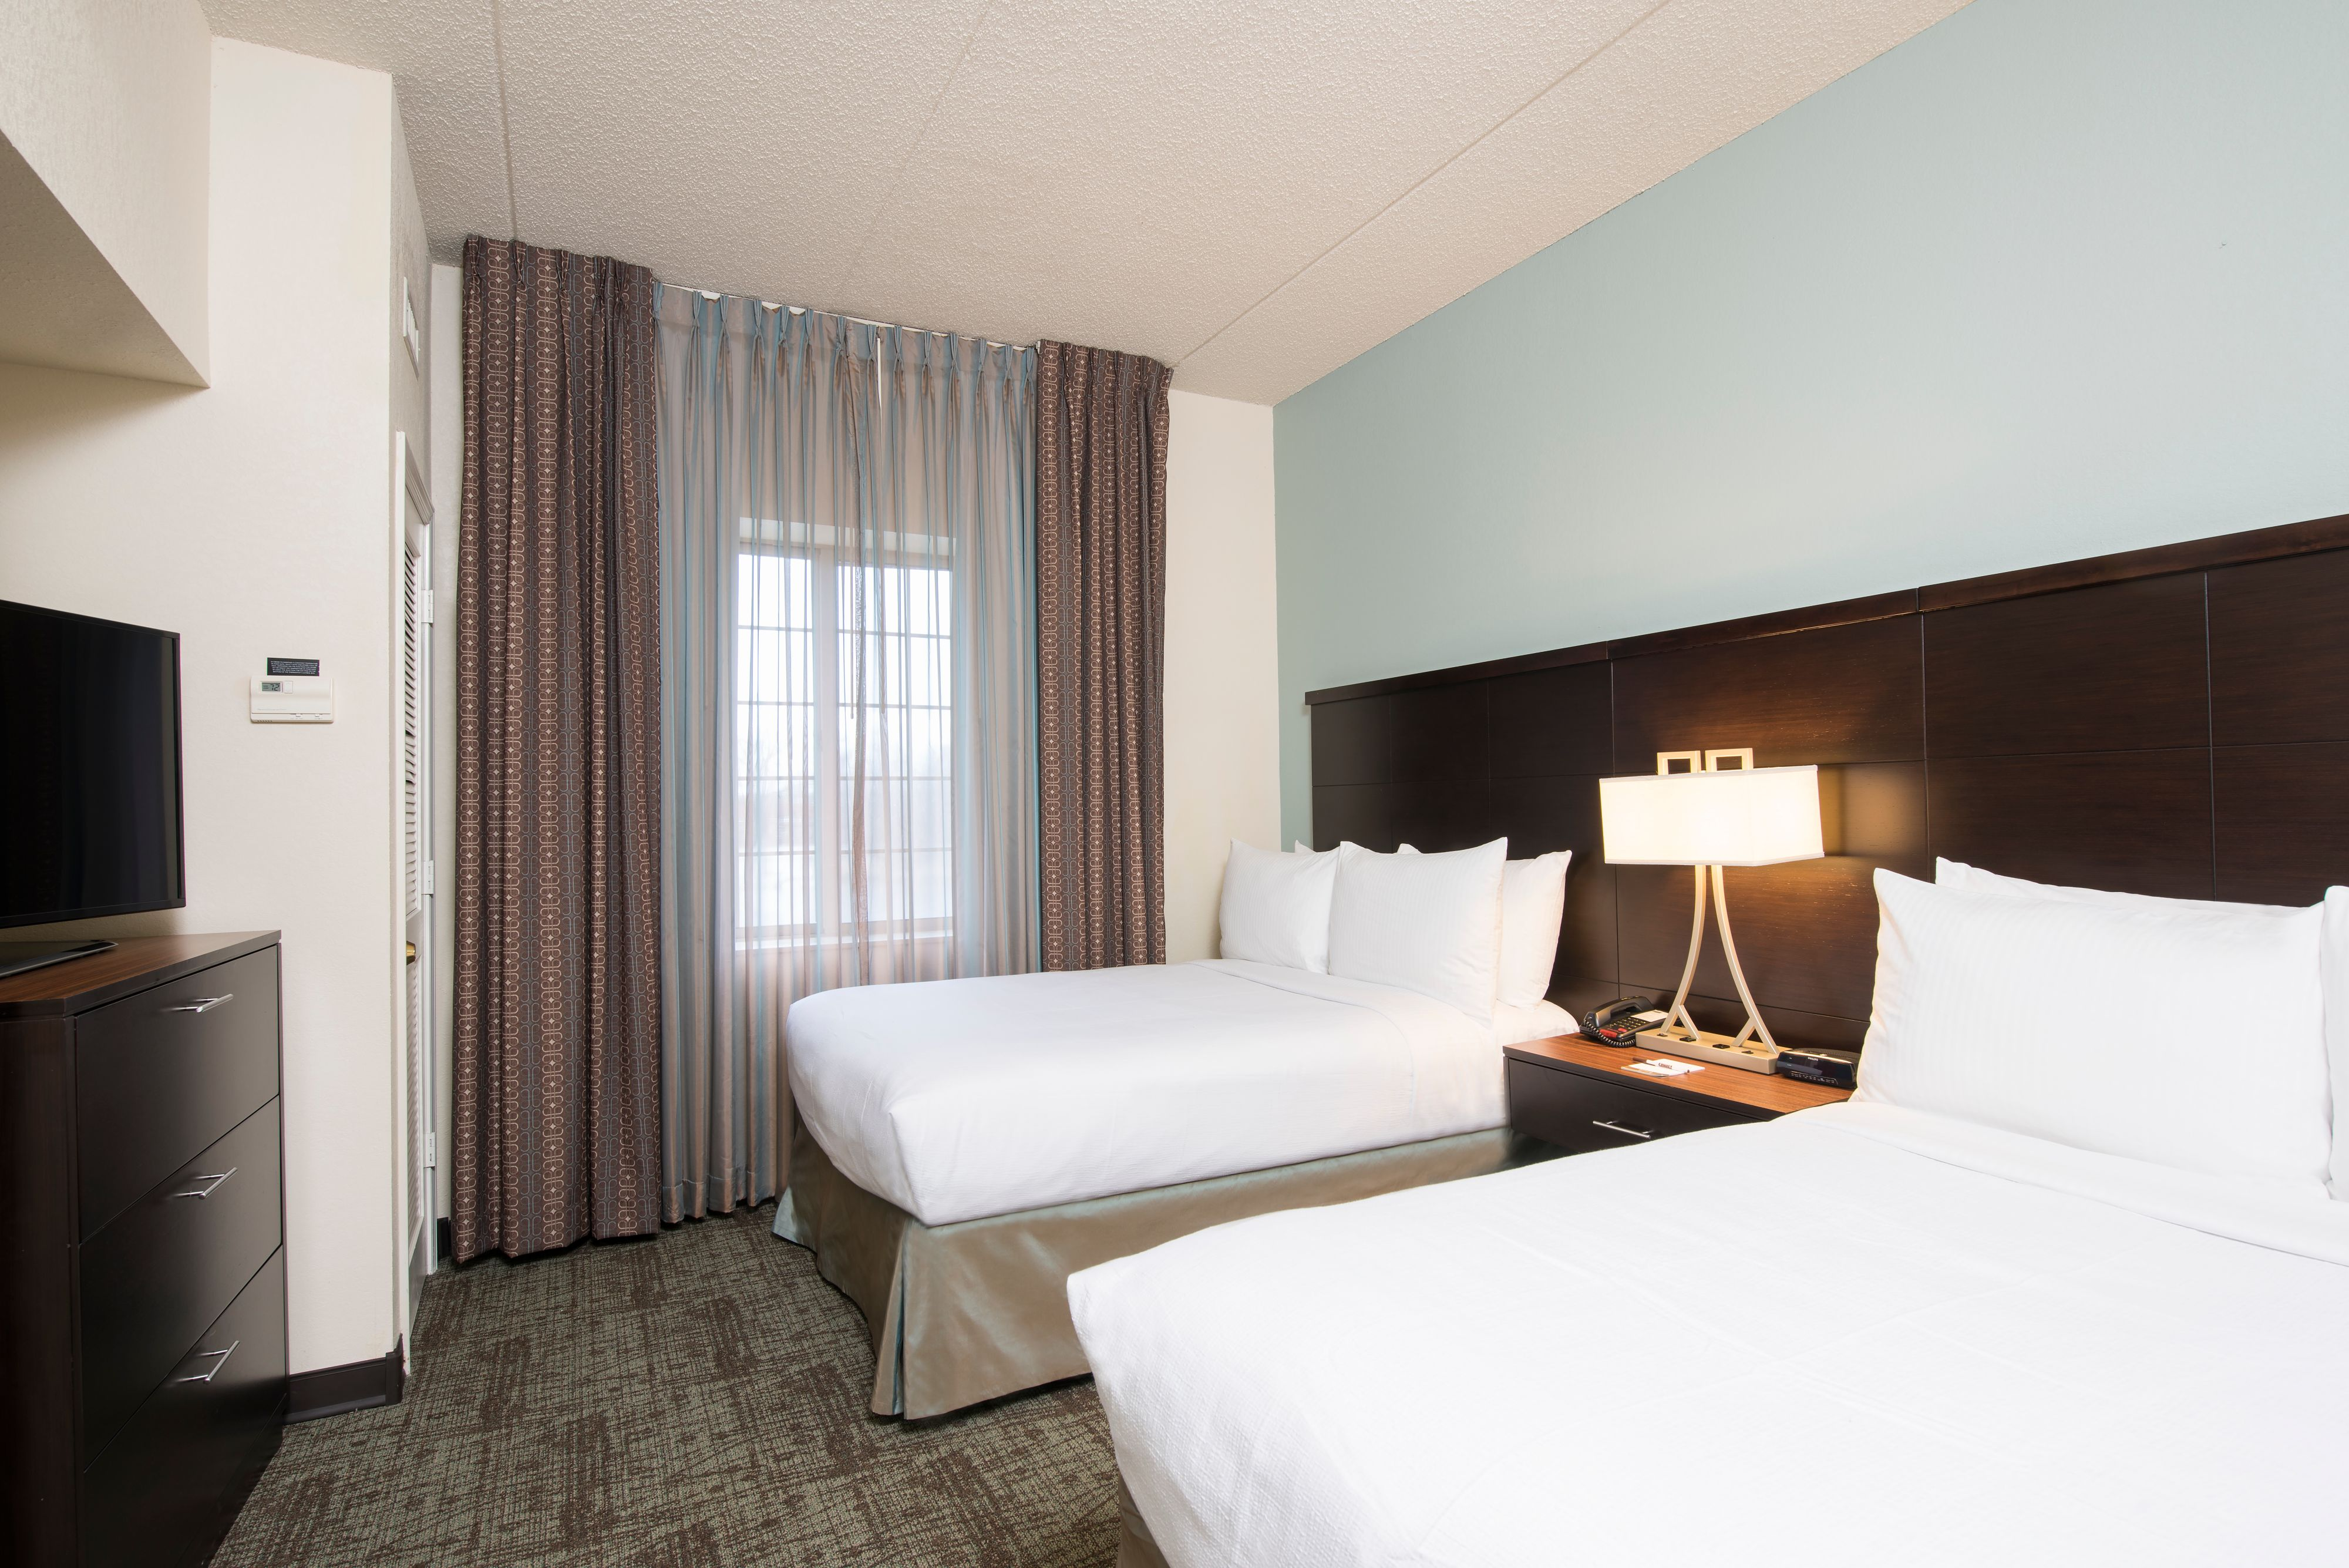 staybridge-suites-oakbrook-terrace-4960029433-original.jpg